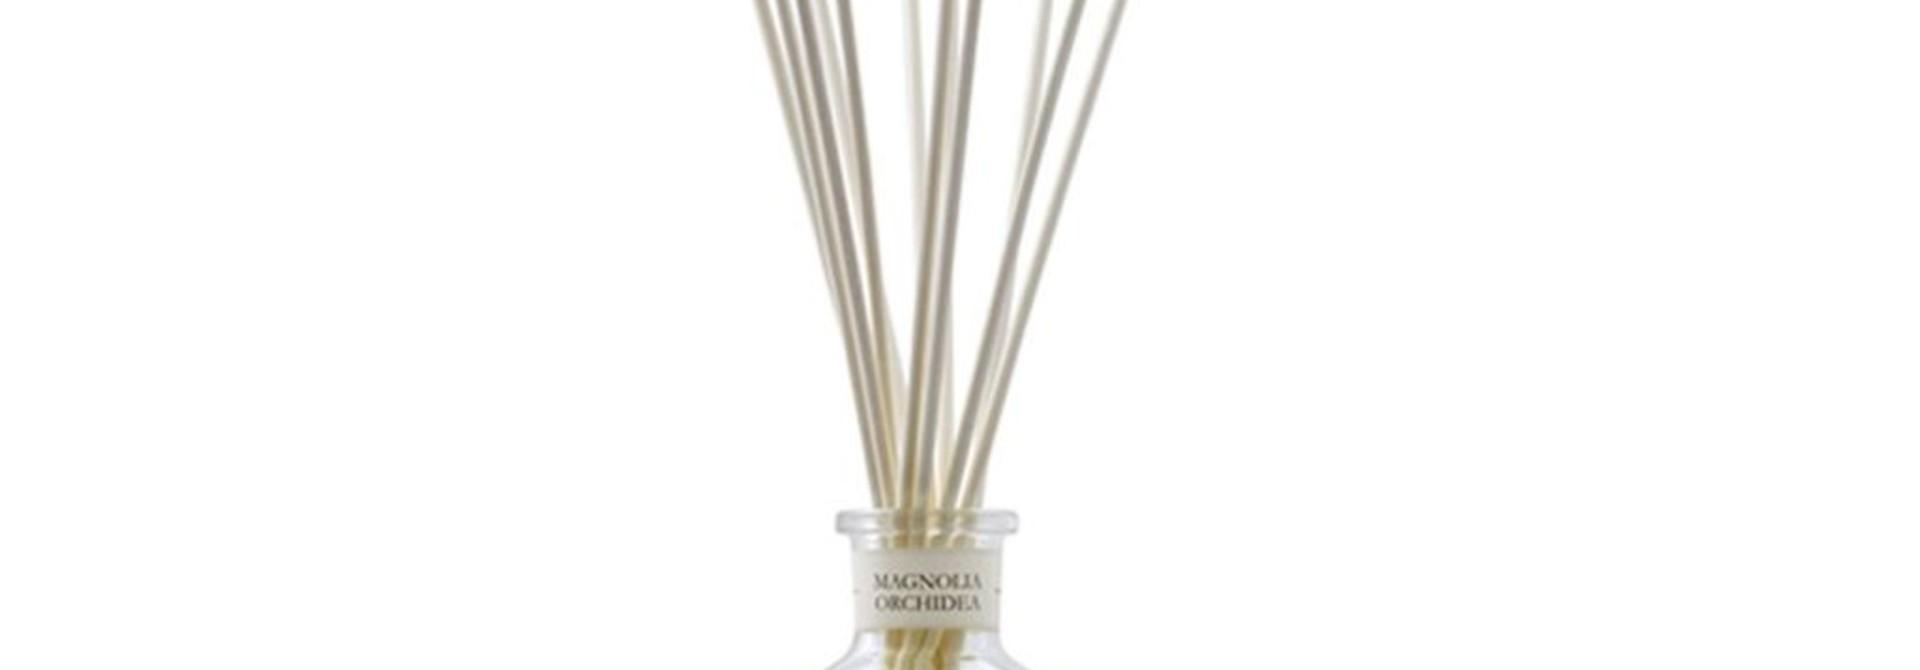 DR VRANJES - Diffuser Magnolia Orchidea 500ml